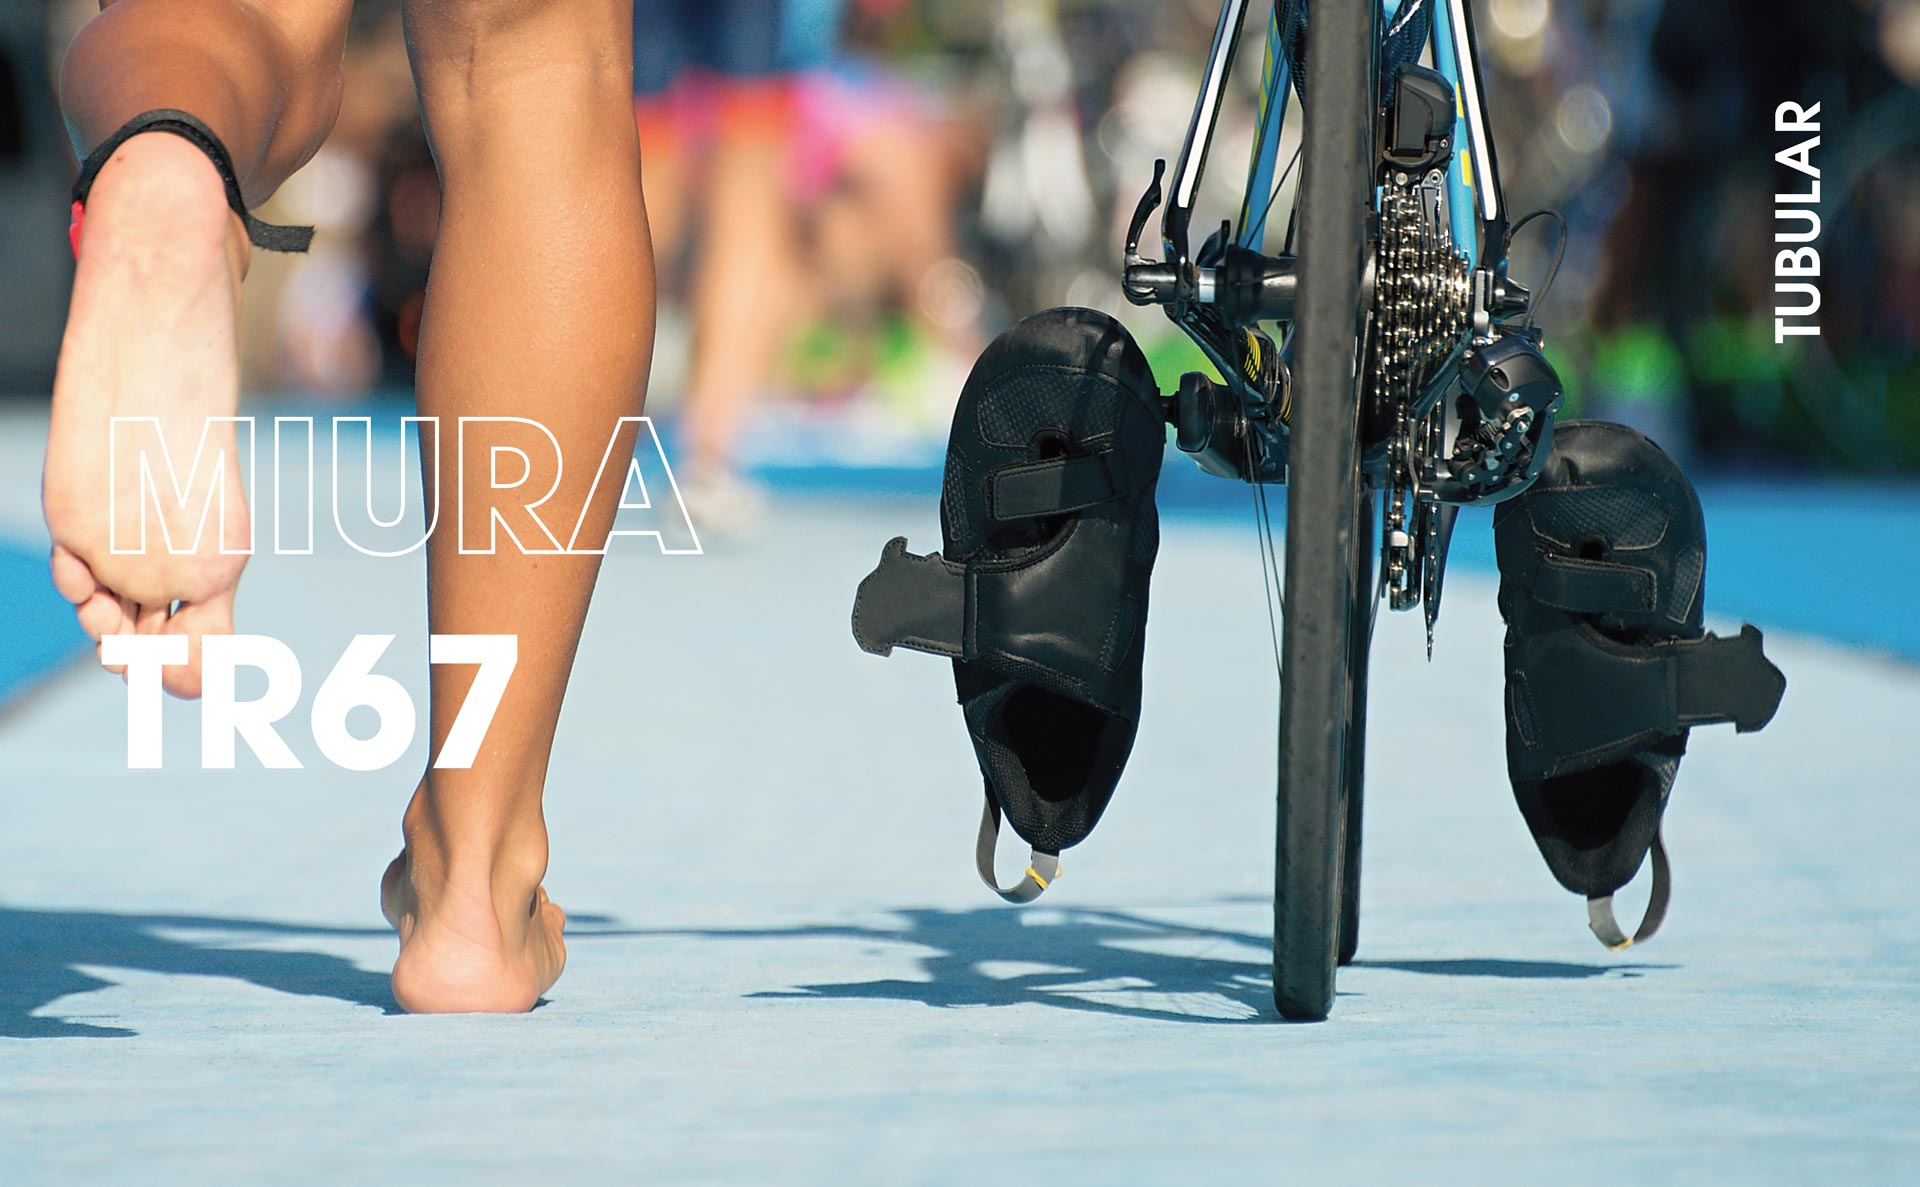 Triathlon_TR67_cover